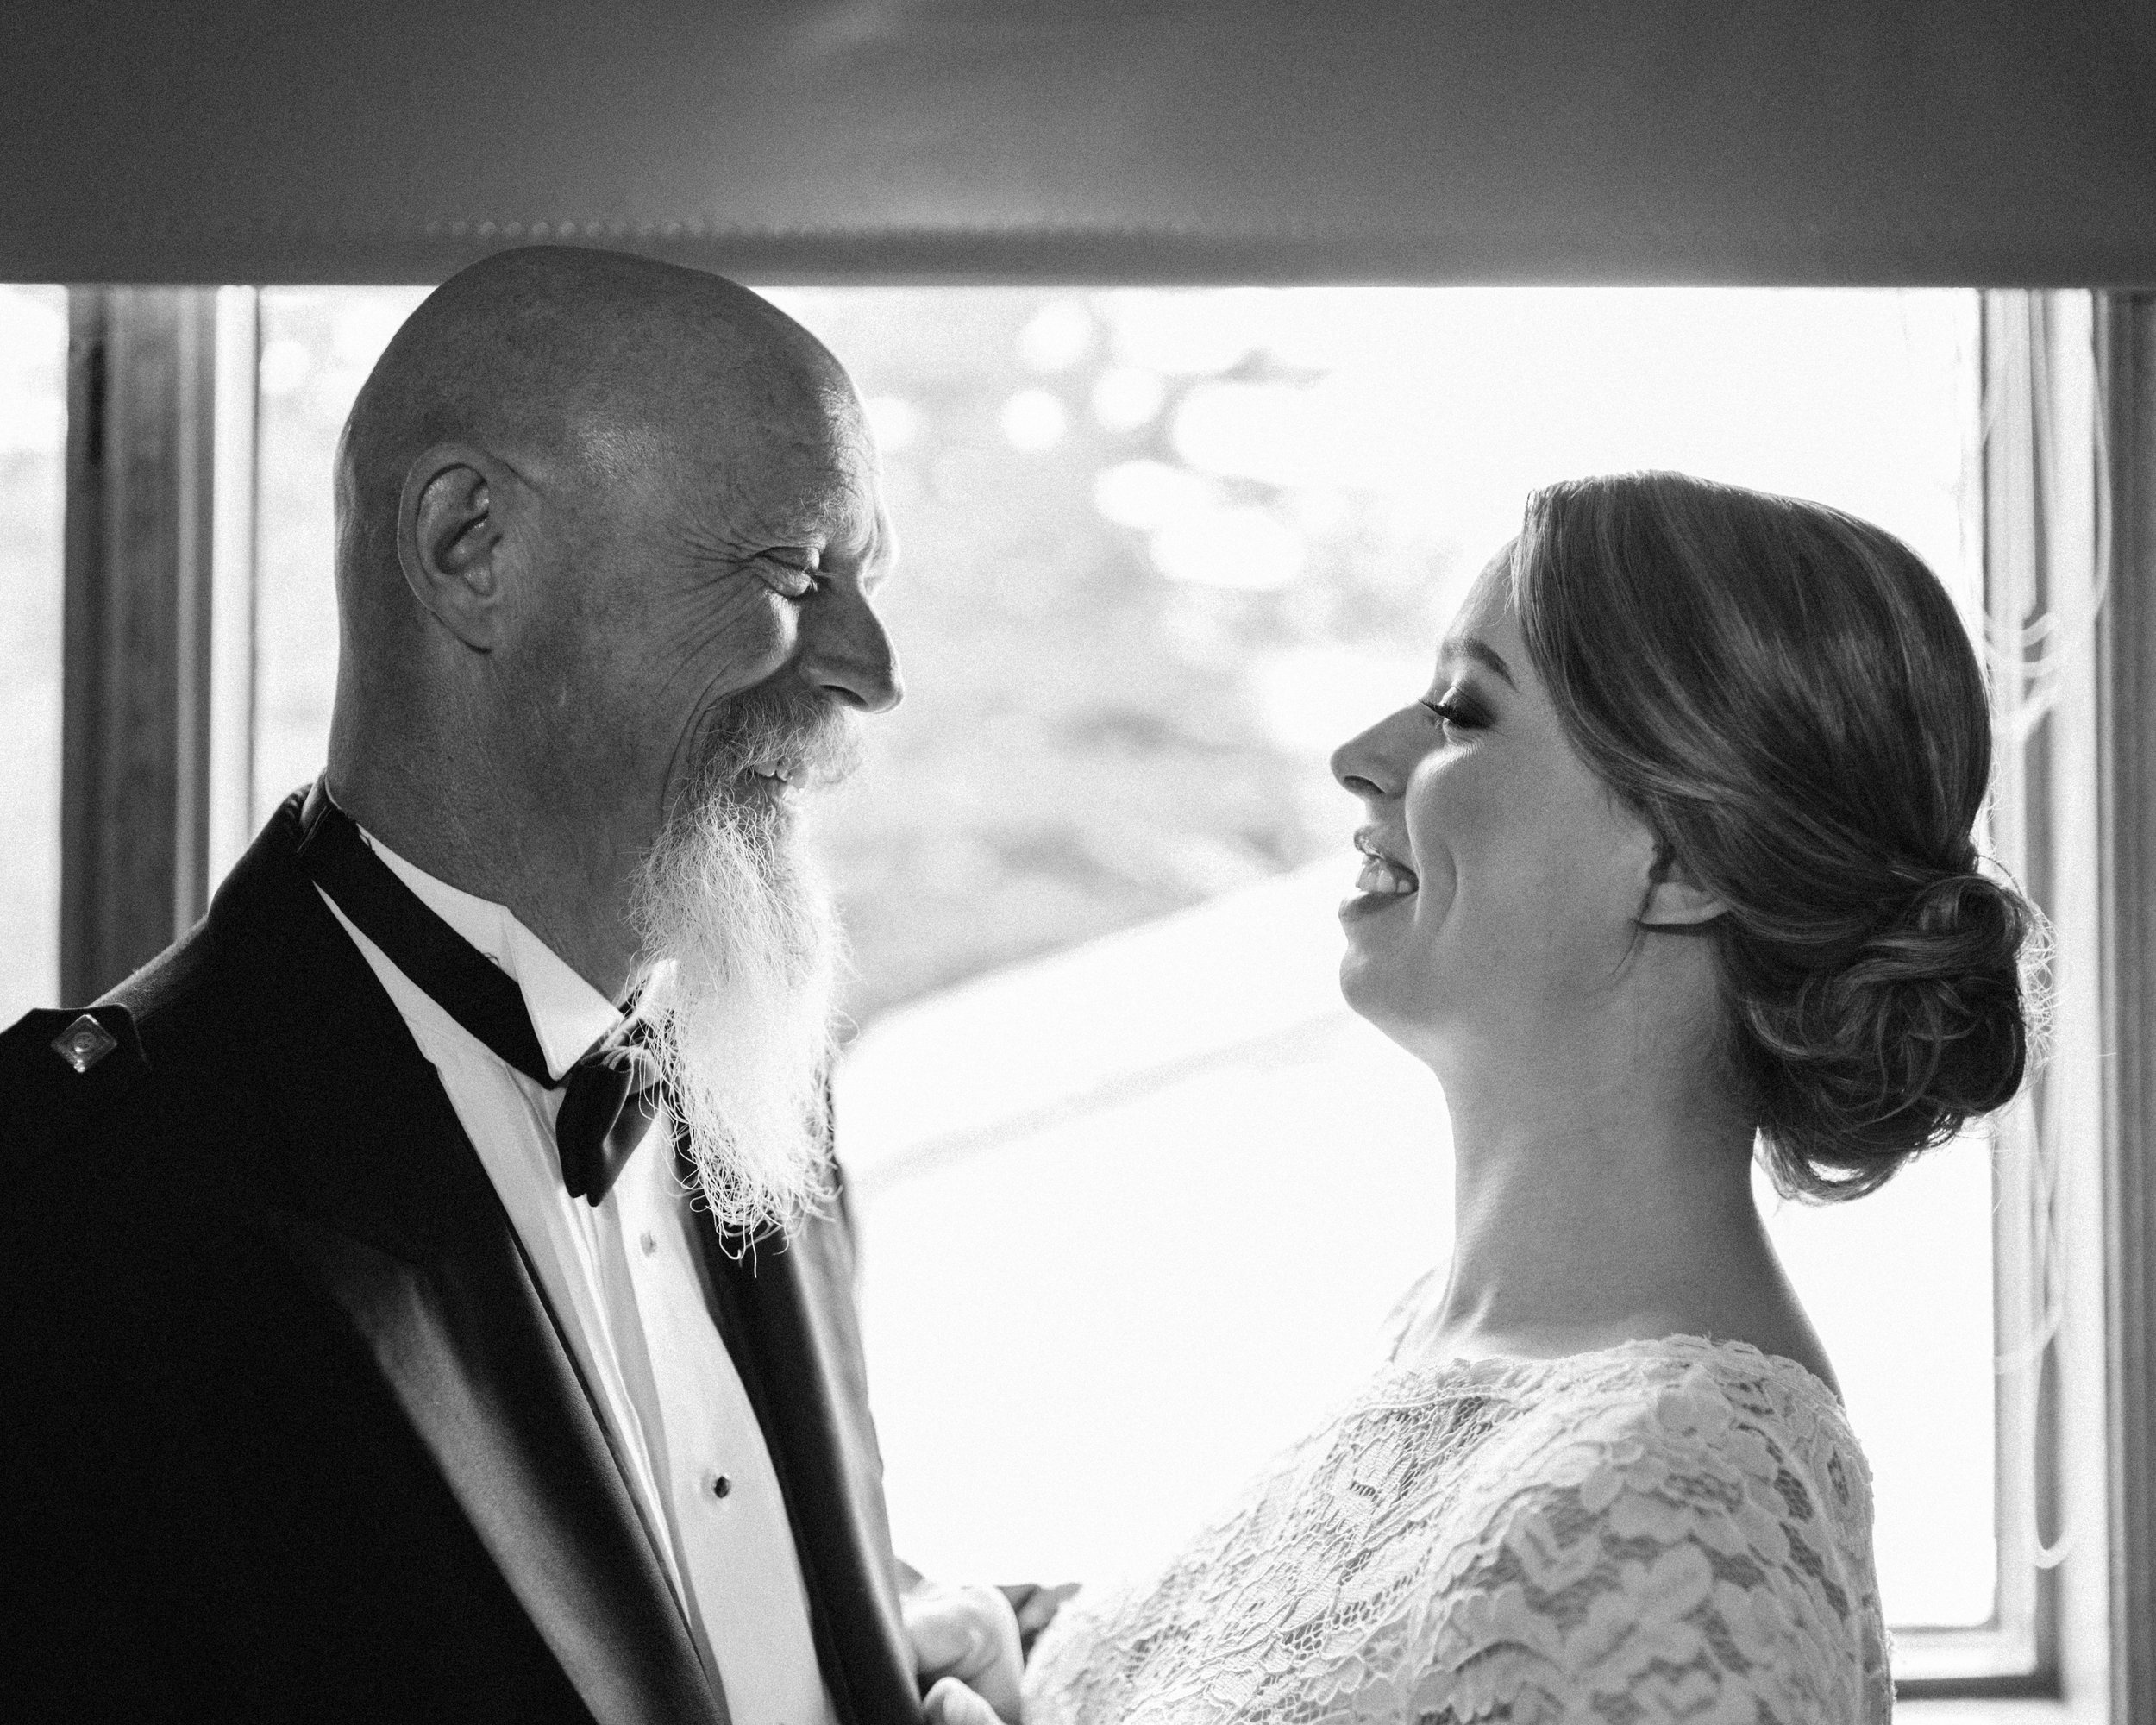 2019_05_28_ANDERSEN_WEDDING_FIRST_BATCH-21.jpg